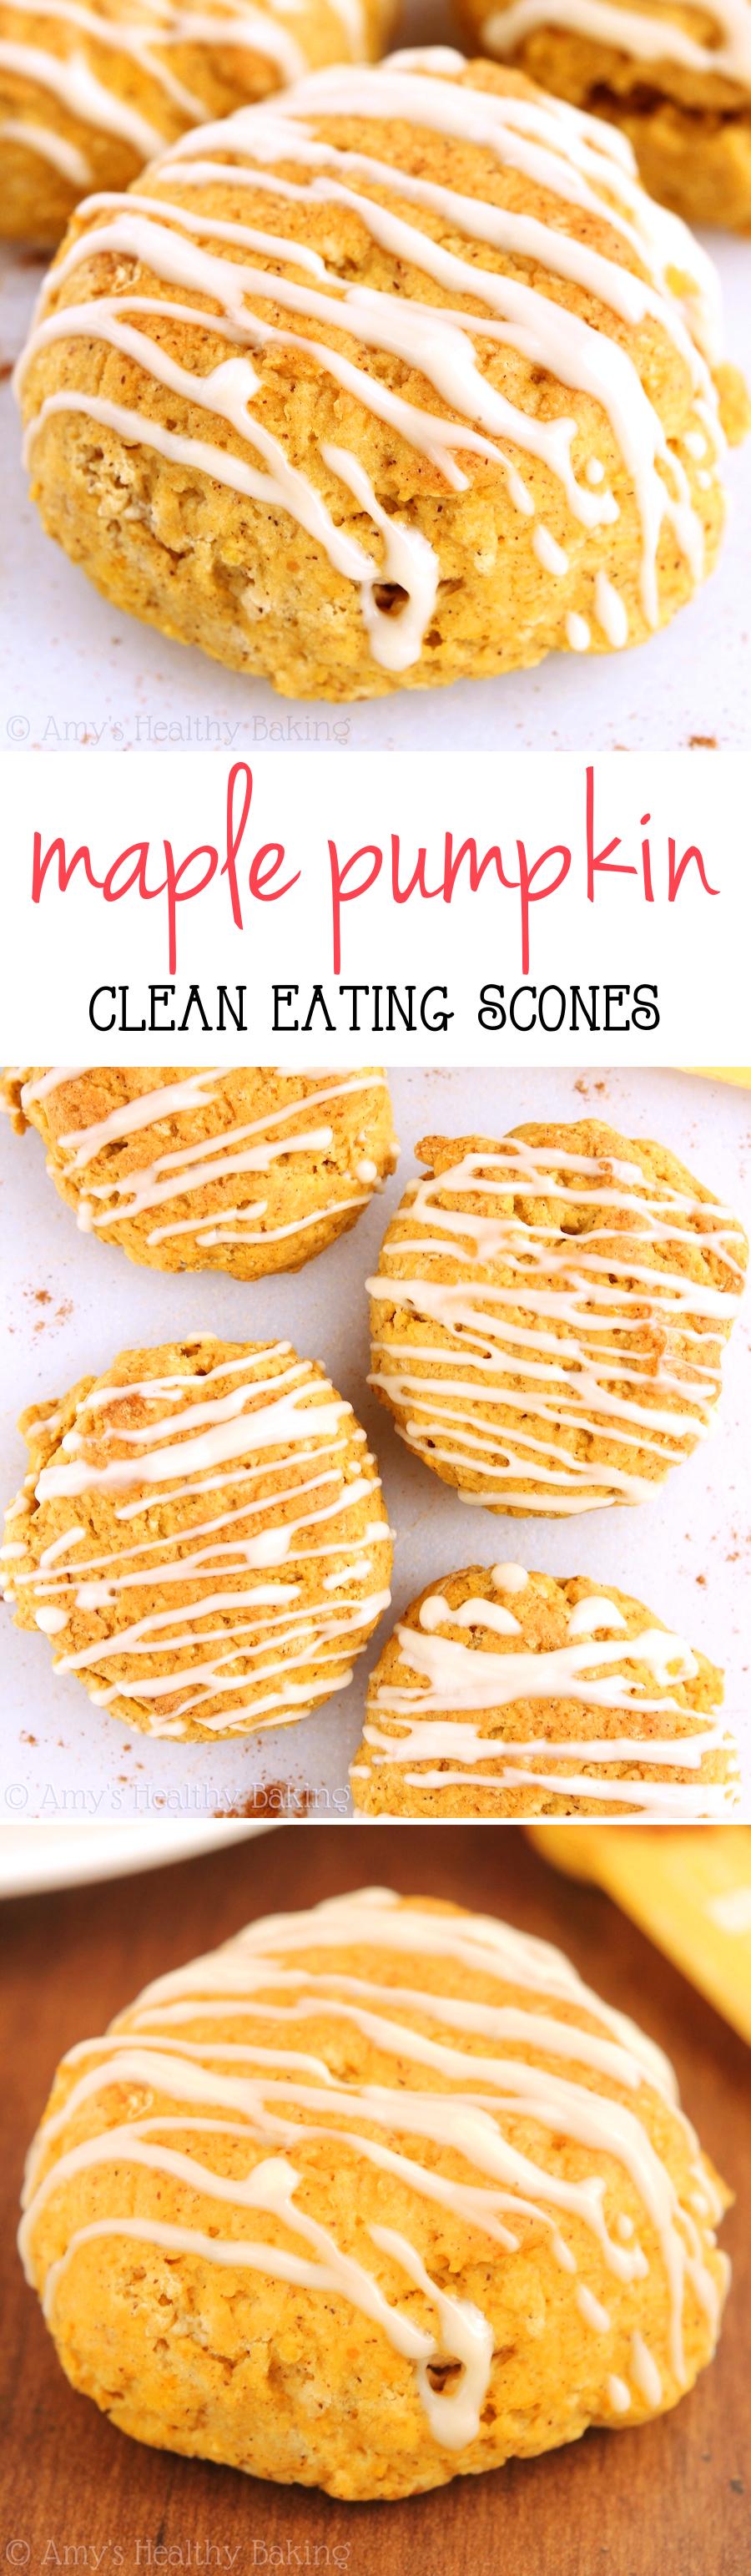 Maple Pumpkin Scones | Amy's Healthy Baking